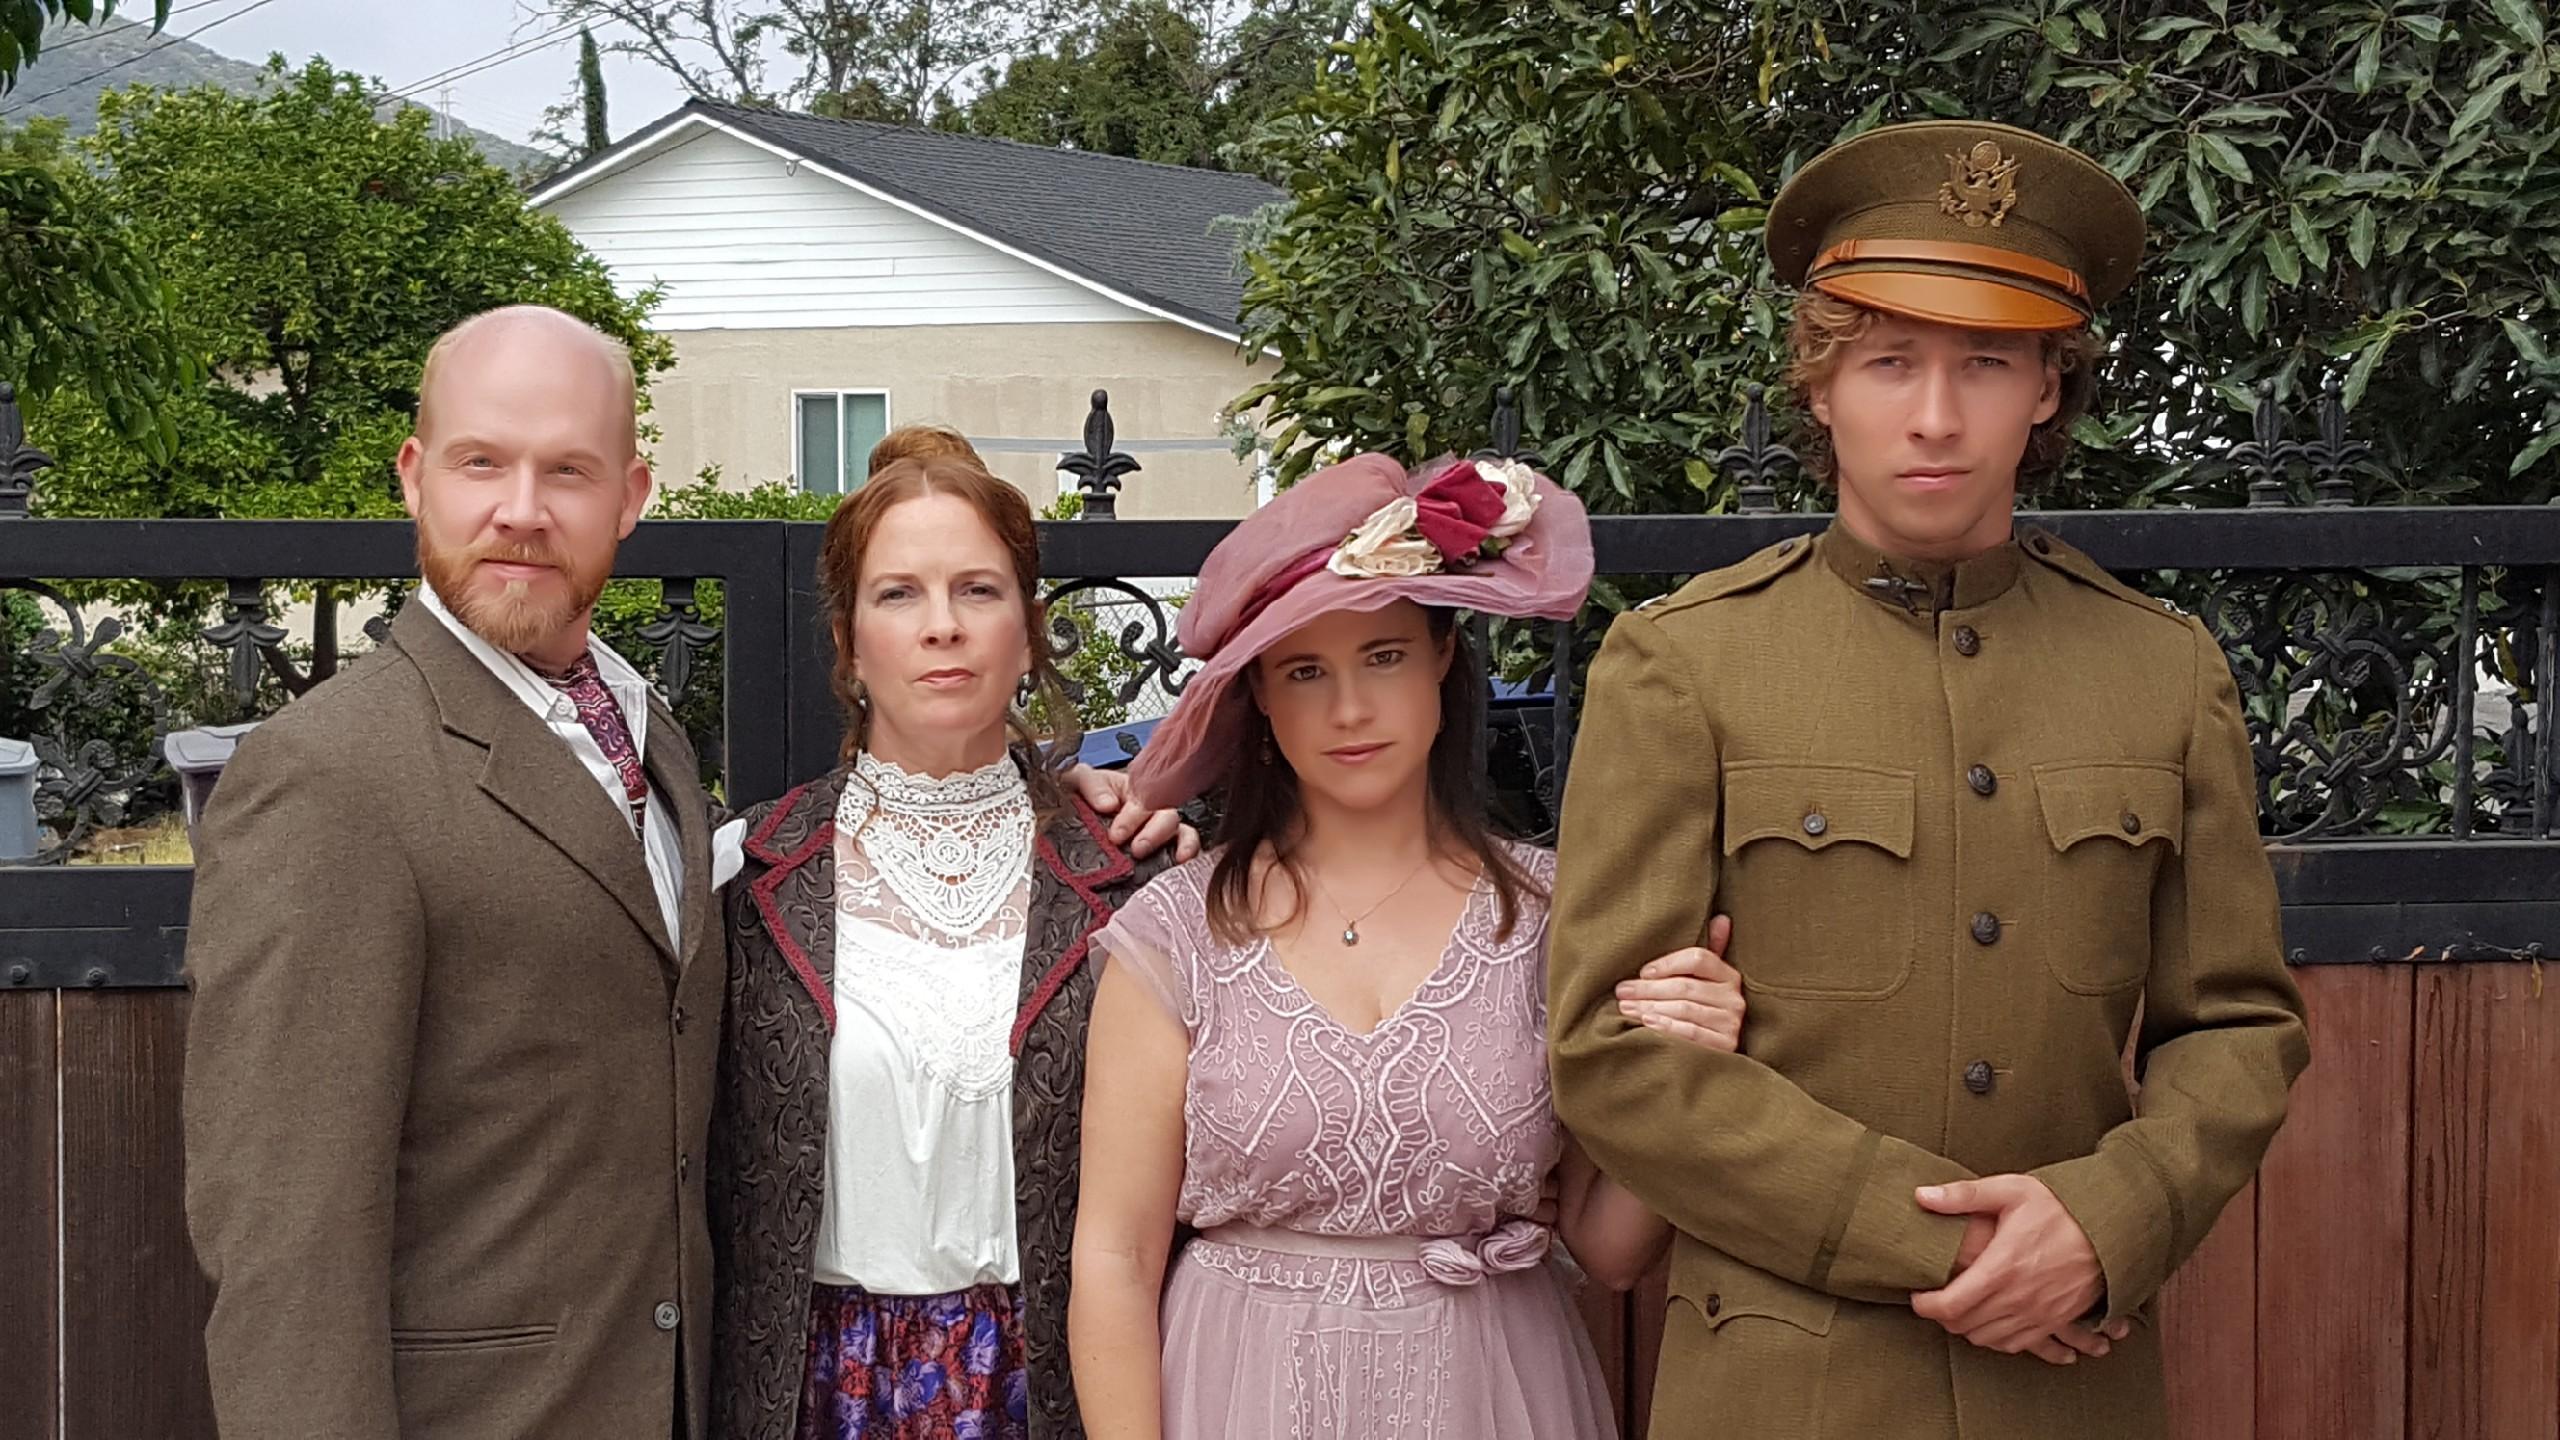 Kevin Gardner, Jen McAllister, Anne Letscher, and Daniel Olson in Compton Abbey (2018)